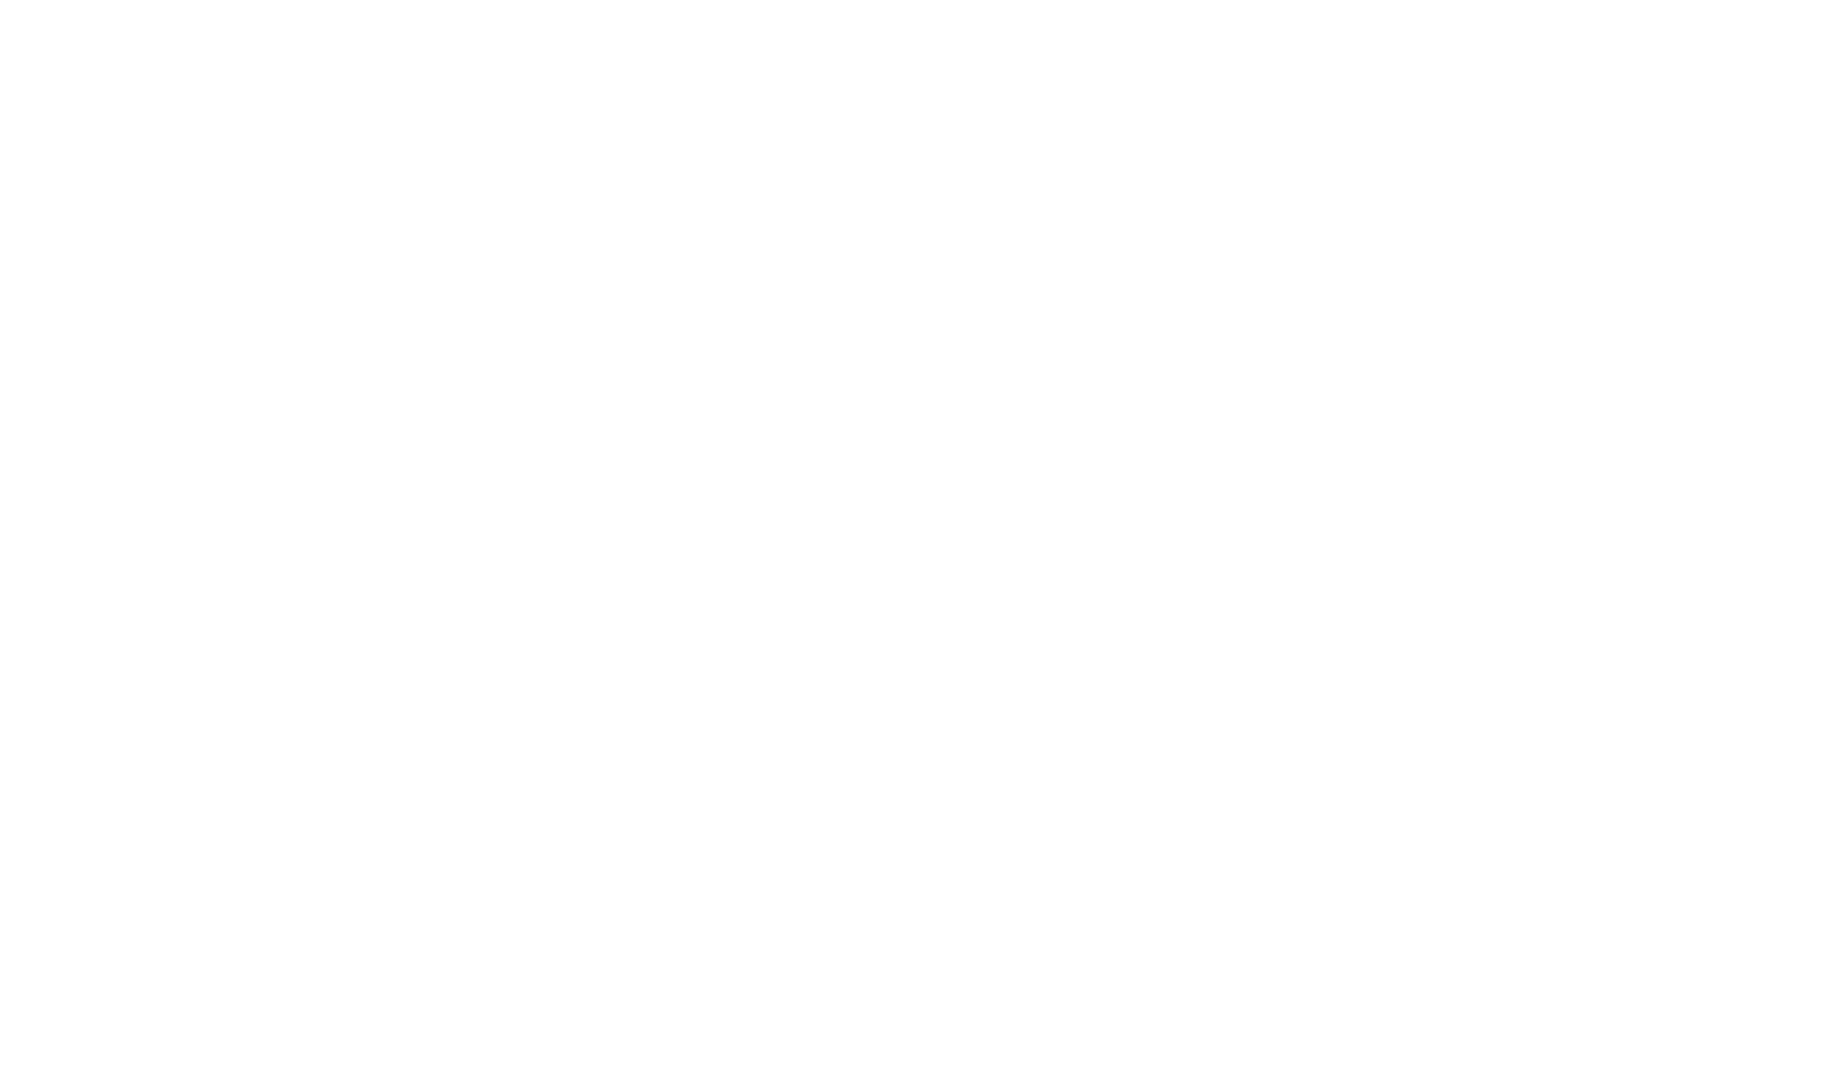 Marquis Visuals , a chatbot developer